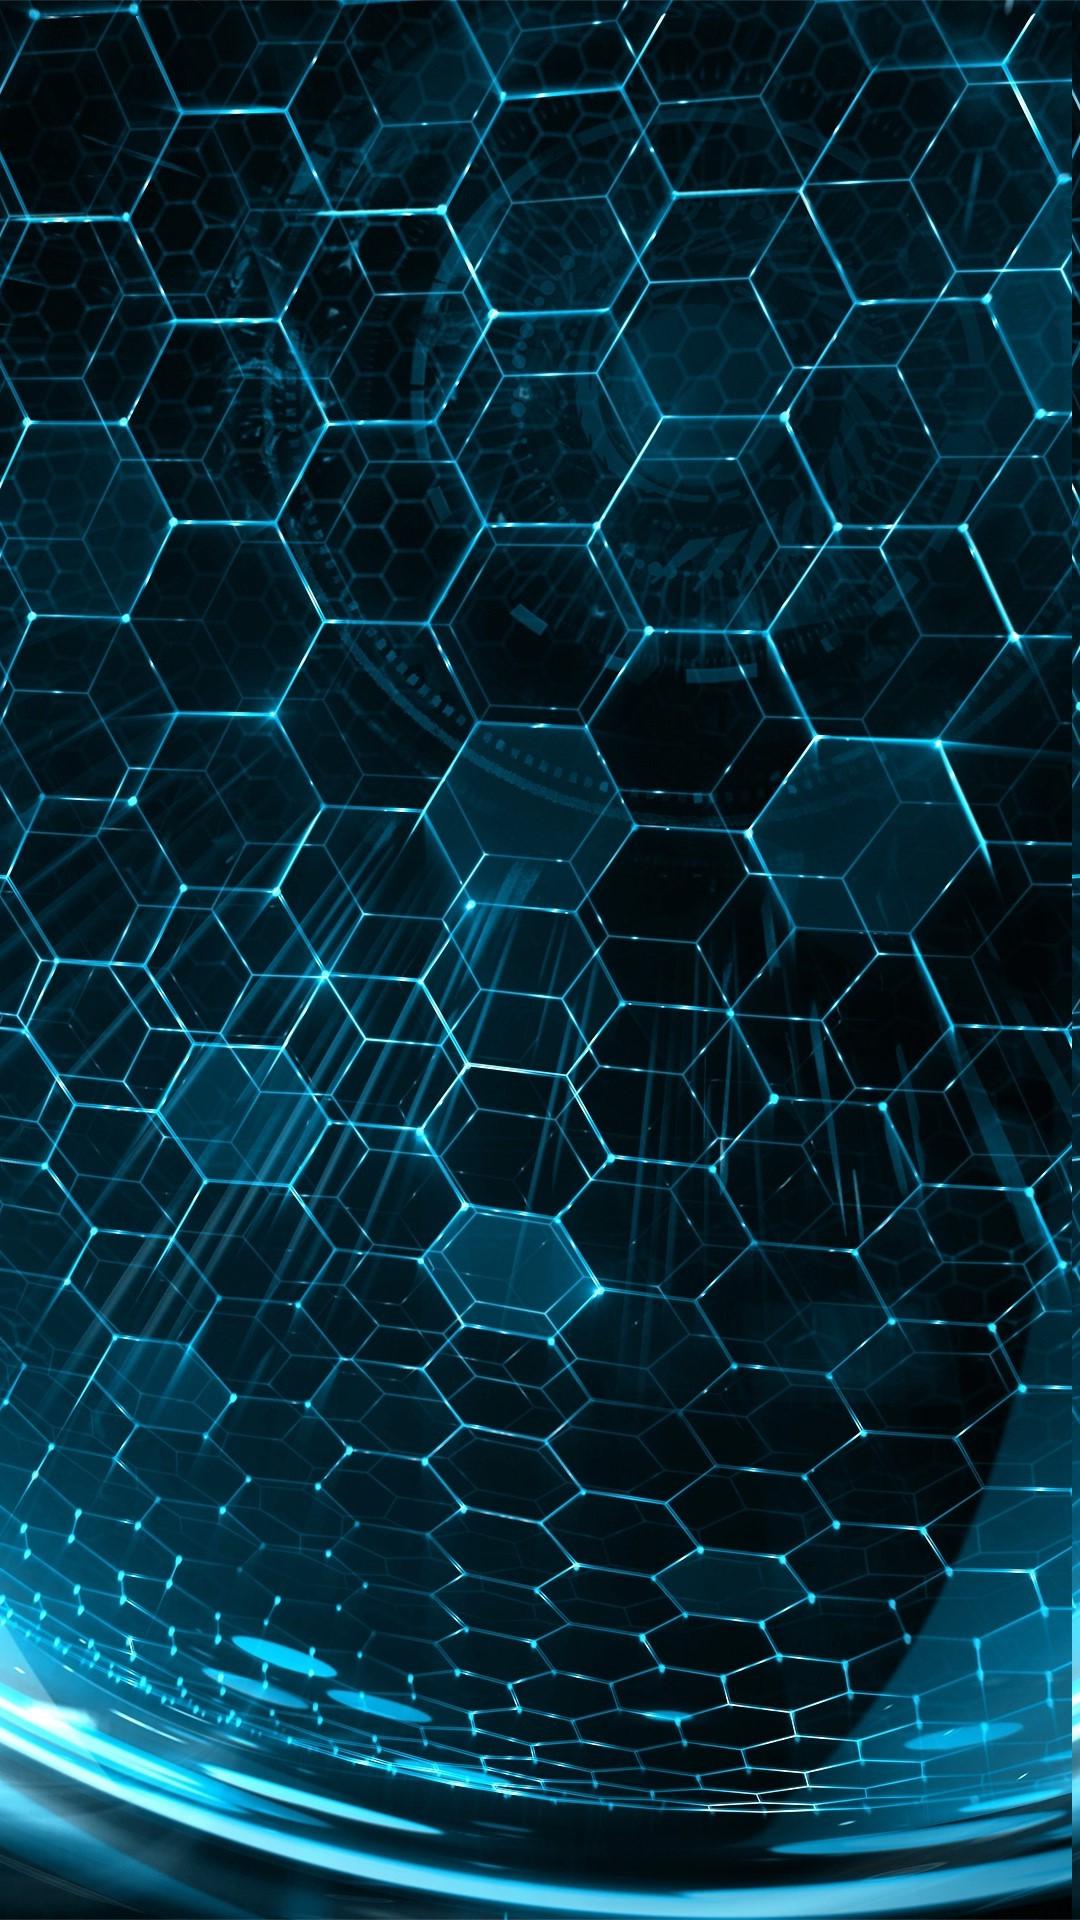 digital art abstract water 3D space minimalism portrait display glowing sphere symmetry blue hexagon pattern geometry